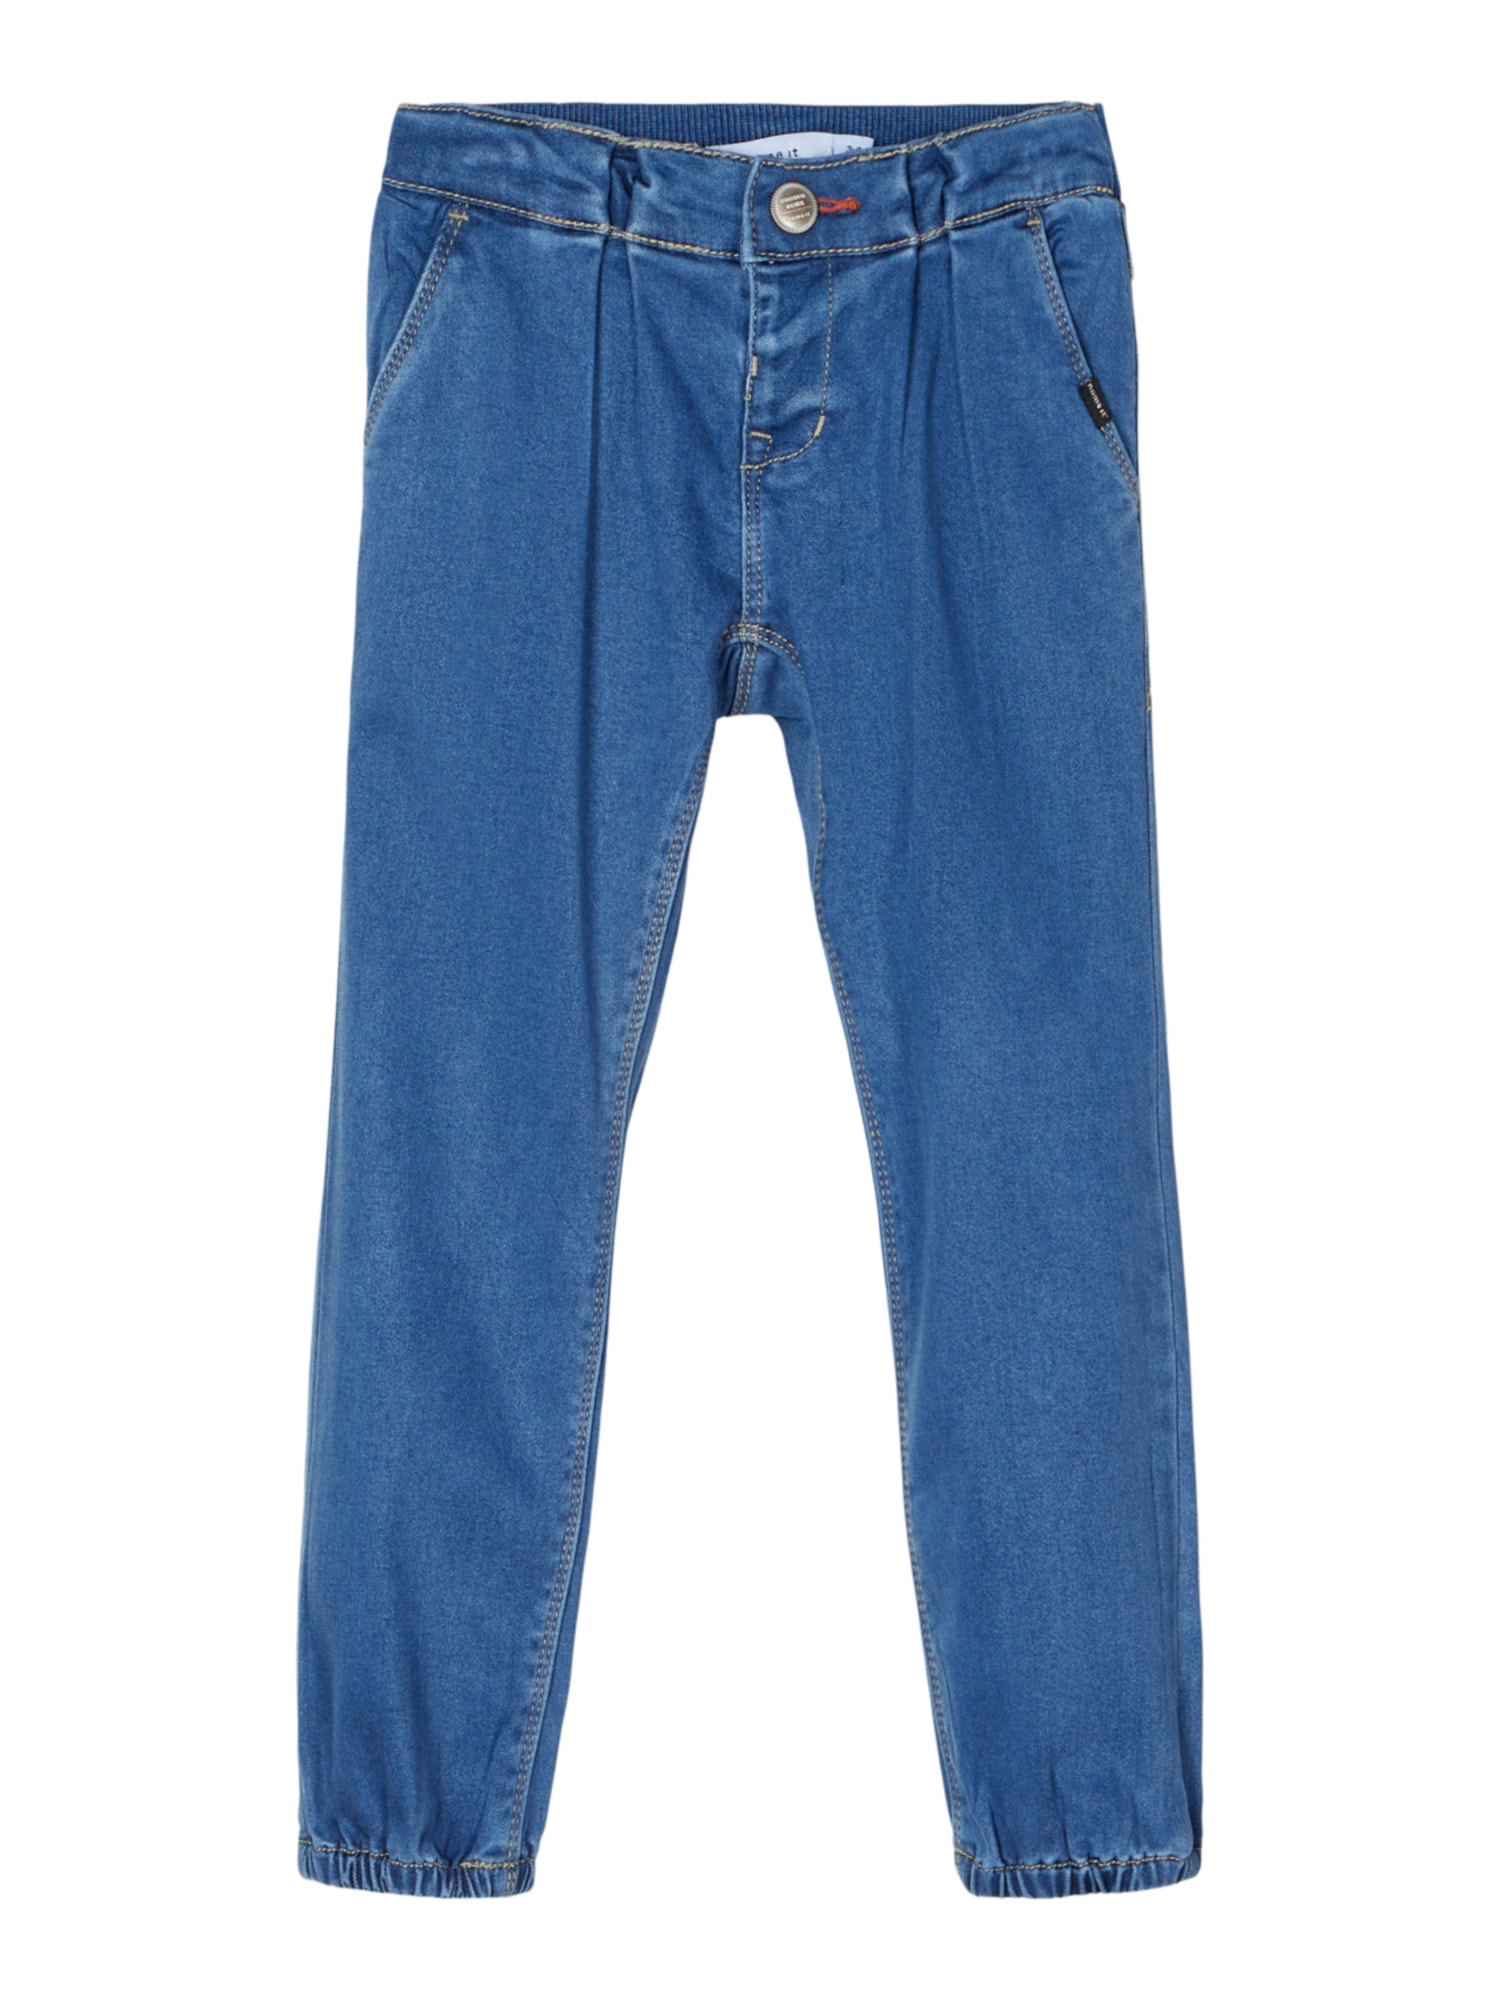 NAME IT Džinsai 'Rie' tamsiai (džinso) mėlyna